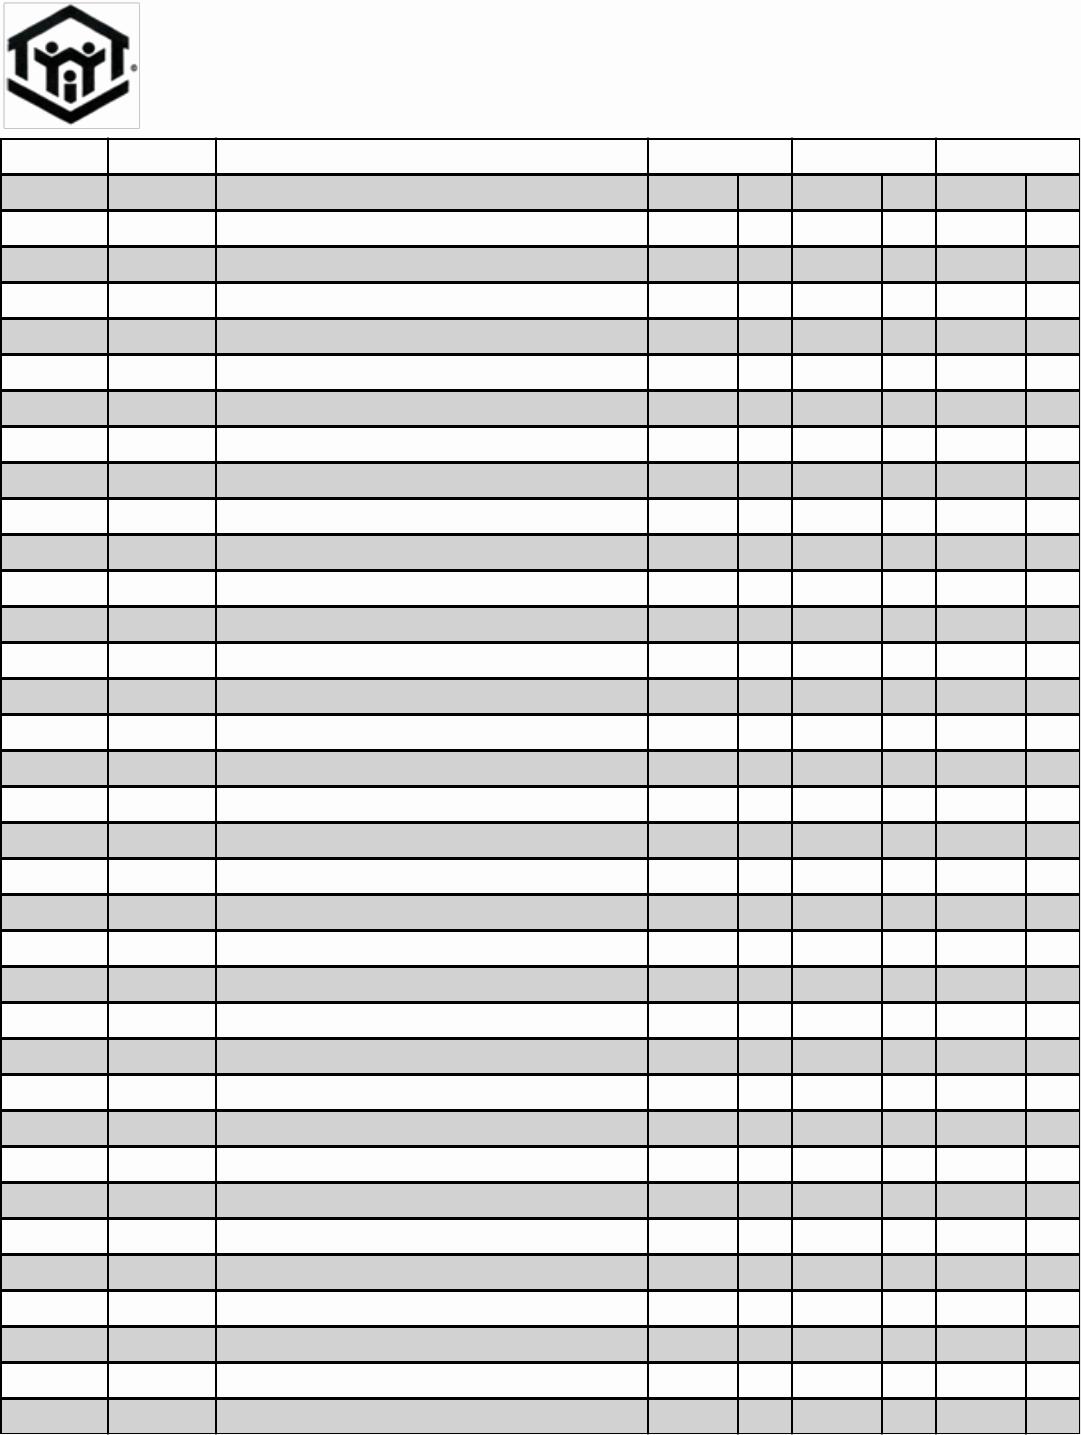 Blank Check Register Template Luxury Blank Checkbook Register Edit Fill Sign Line